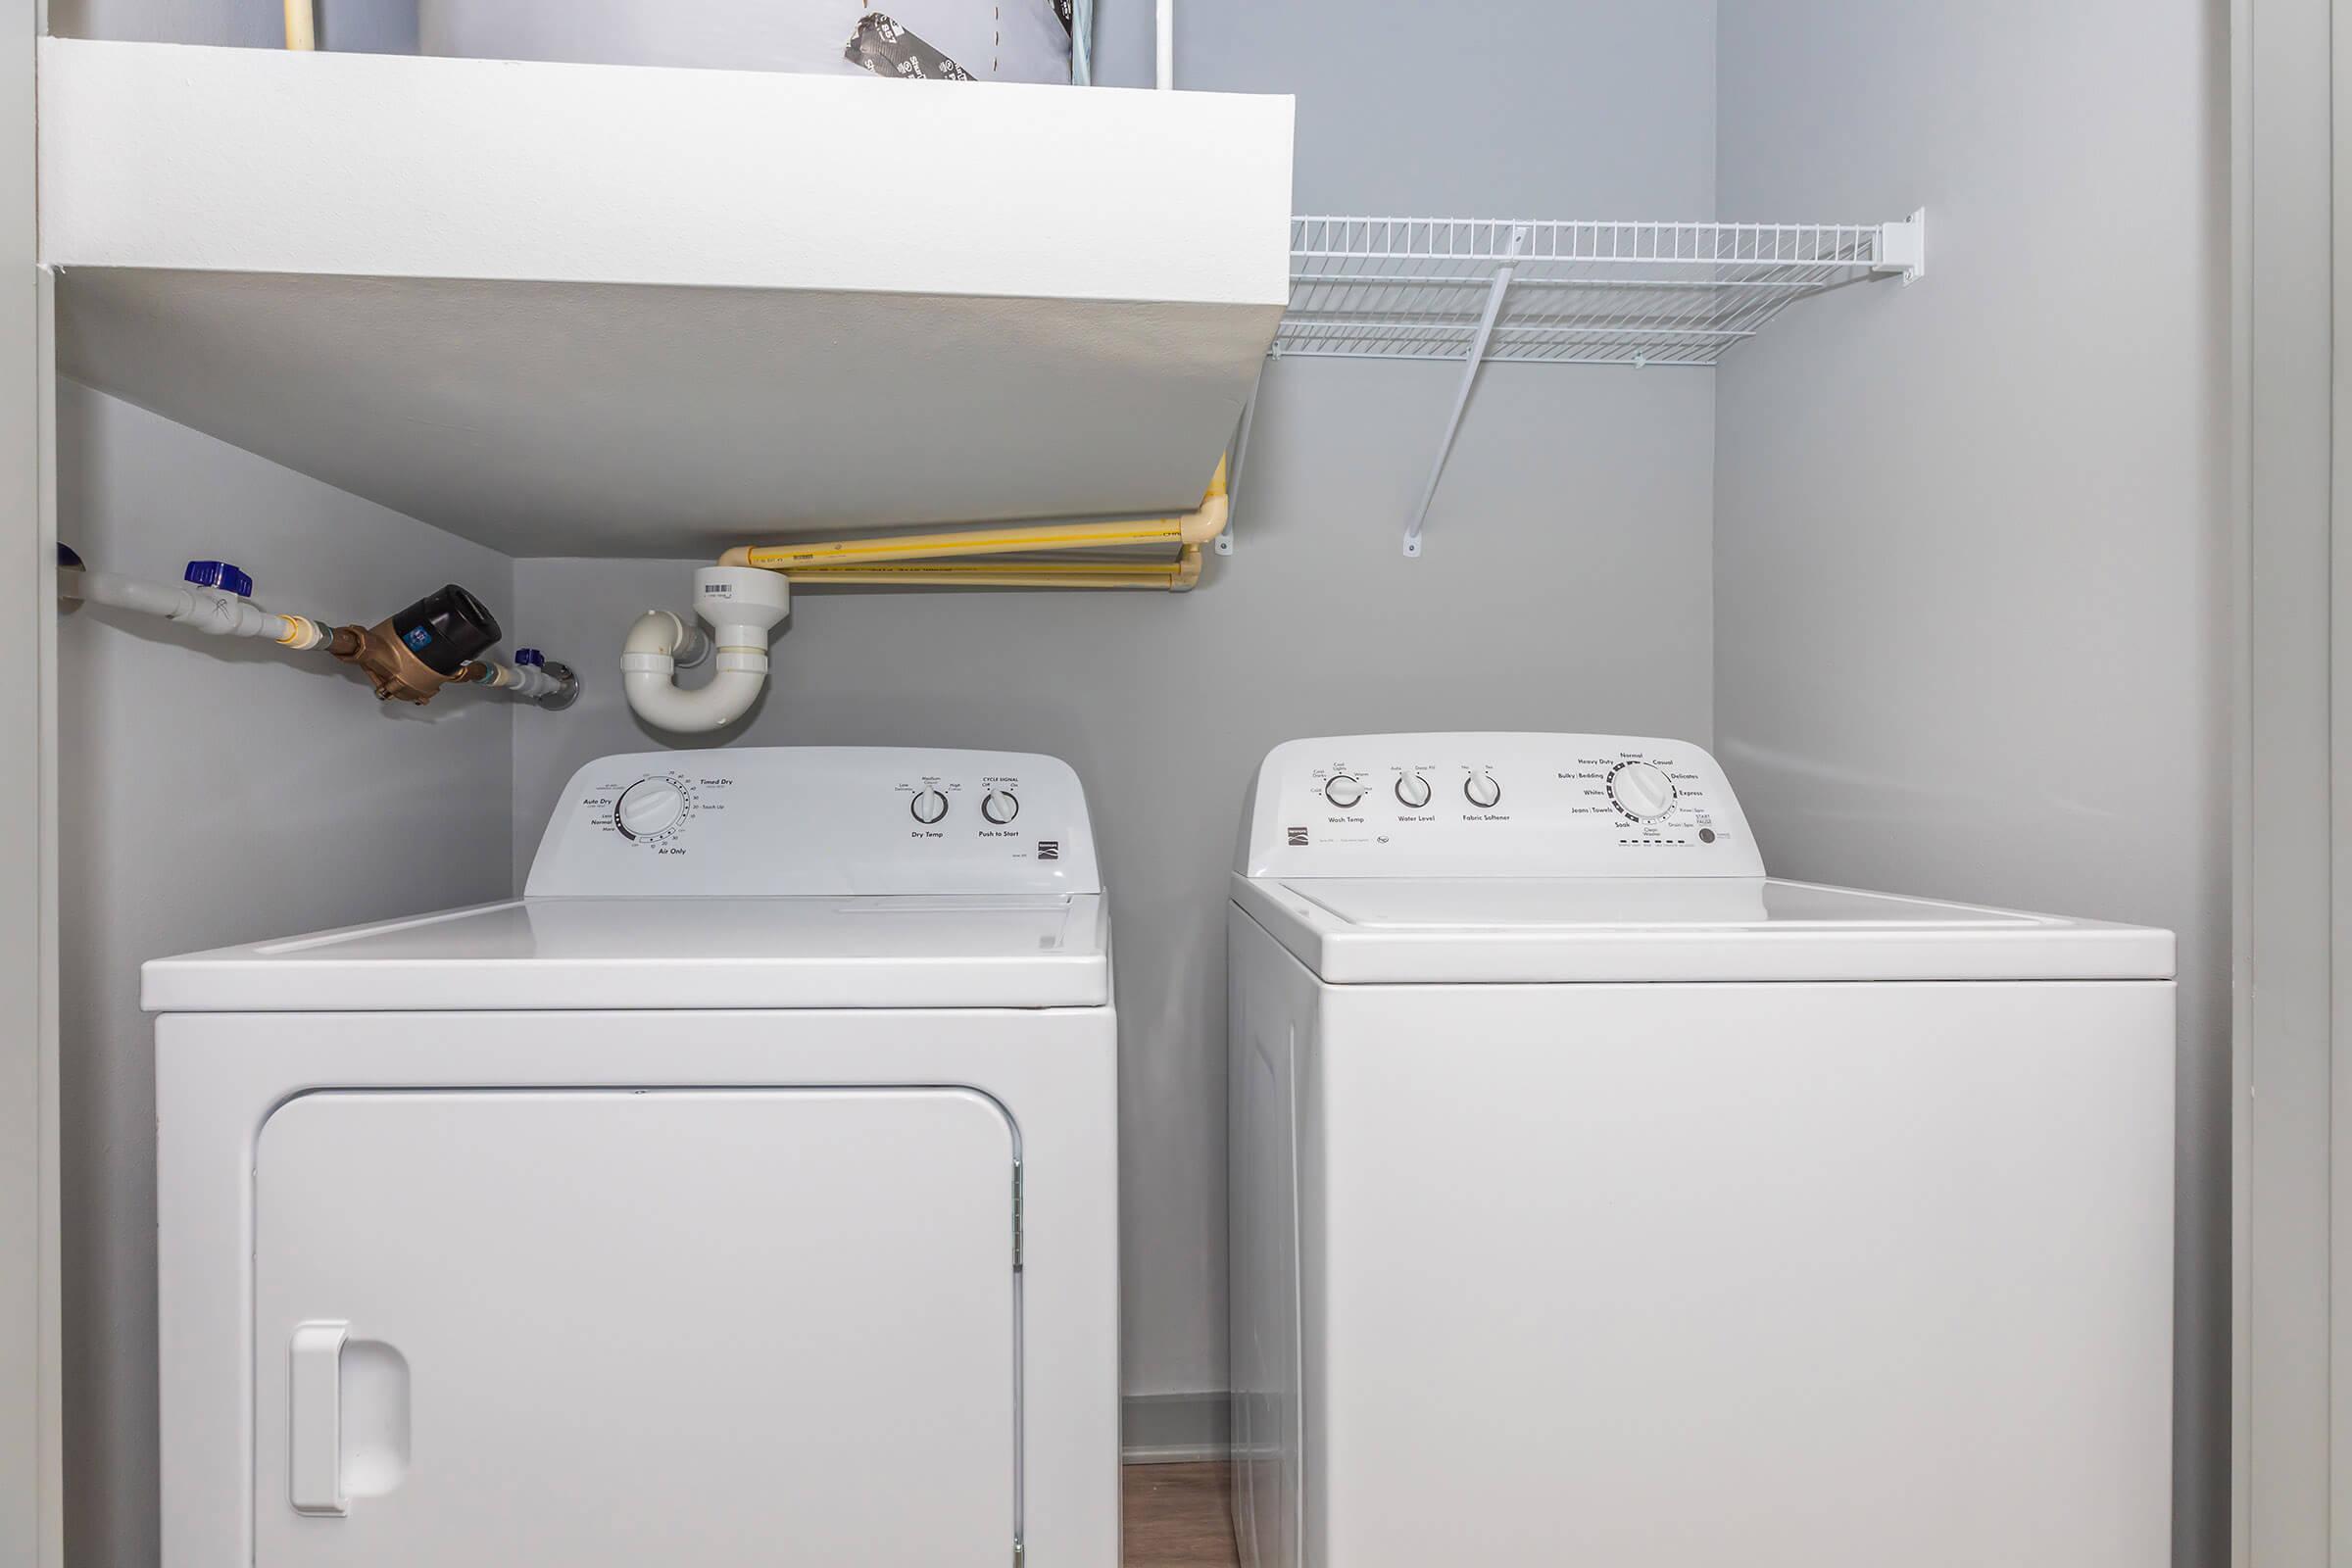 a refrigerator freezer sitting next to a sink